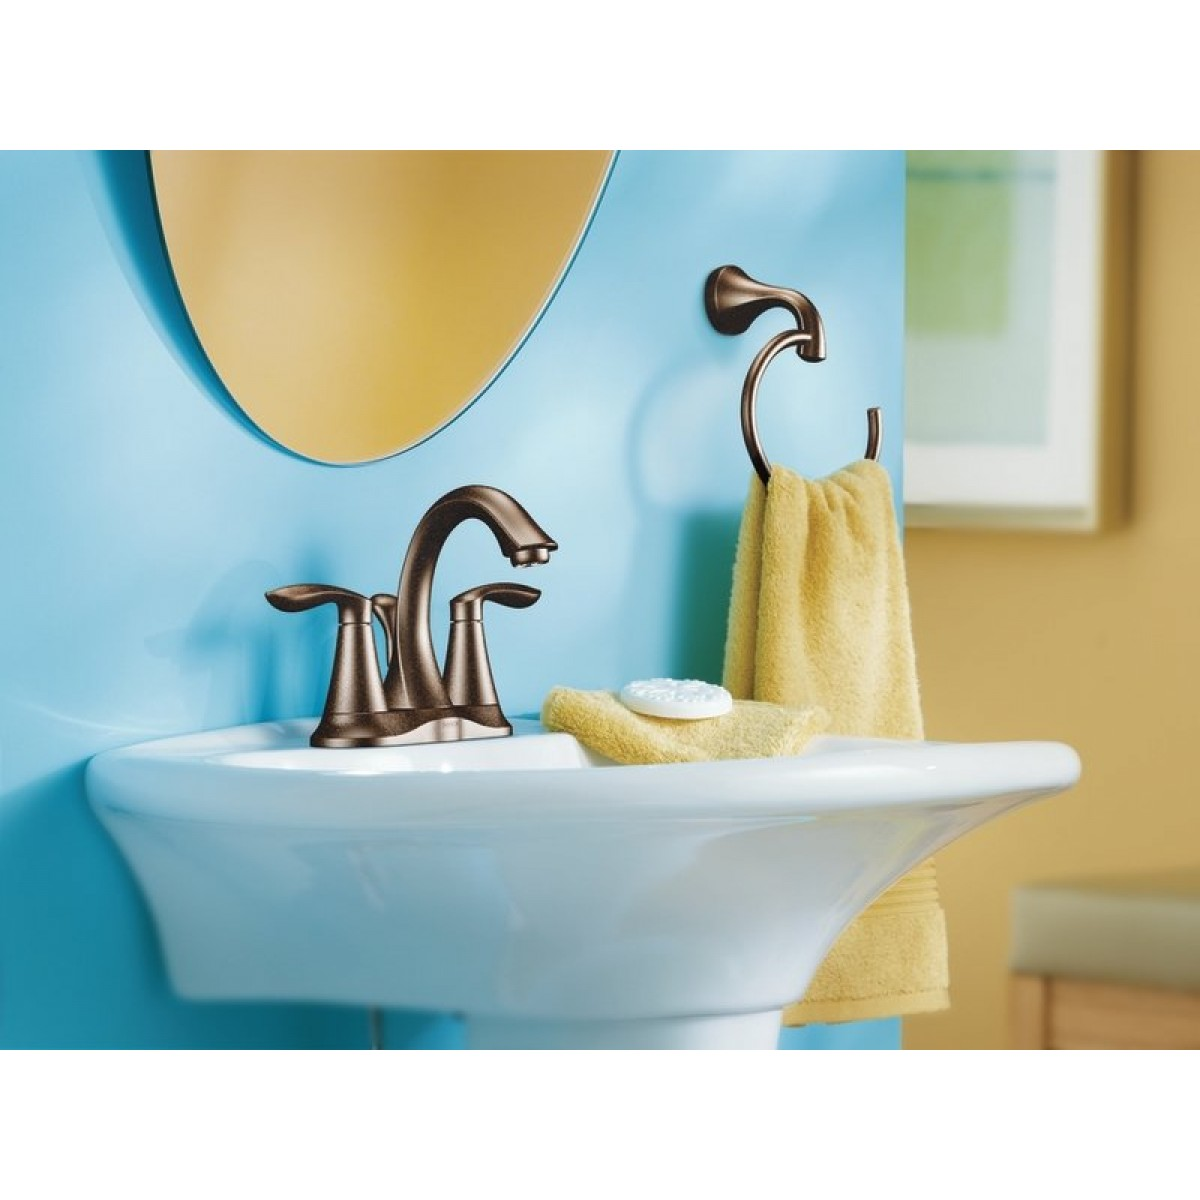 Moen Eva Centerset Lead Free 3 Hole High Arc Bathroom Faucet Oil ...